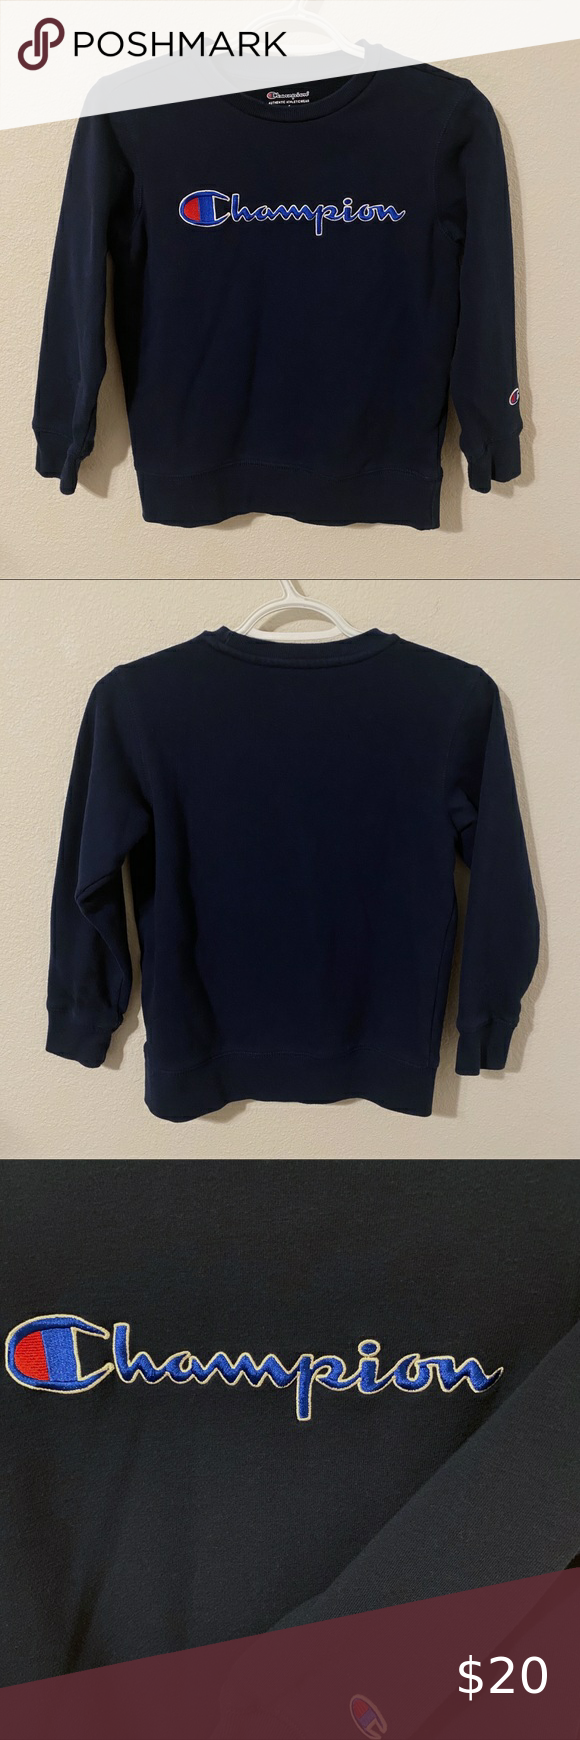 Champion Sweatshirt Champion Dark Navy Blue Sweatshirt Labeled As A Boys Small Fits Like A Women S Xs Only F Champion Sweatshirt Sweatshirts Sweatshirt Tops [ 1740 x 580 Pixel ]